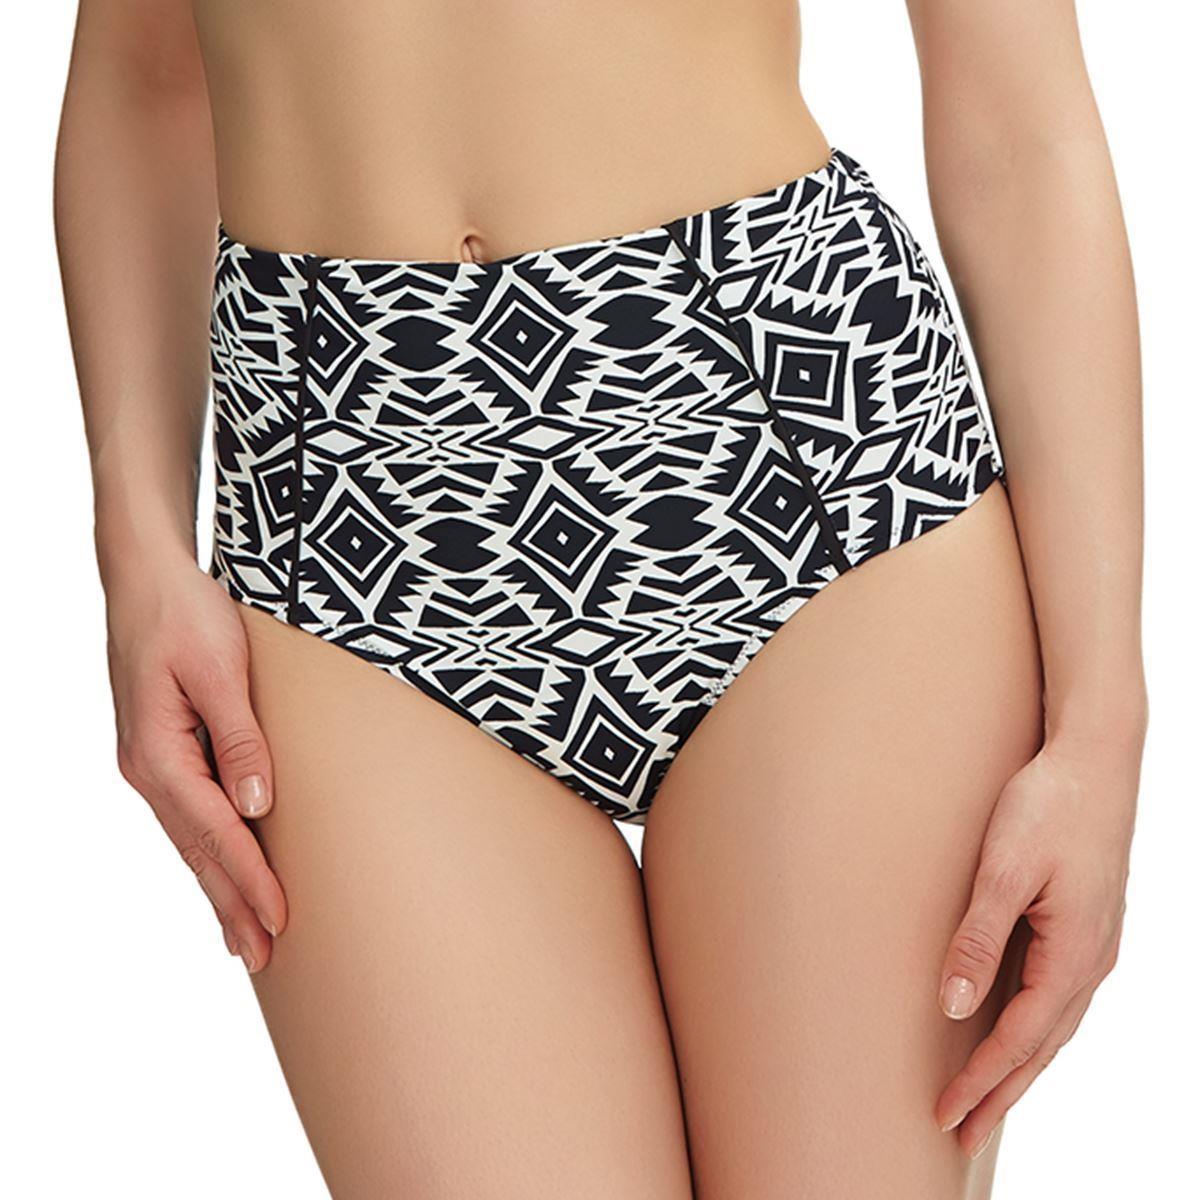 Fantasie Beqa High Rise Bikini Brief - Black/Cream